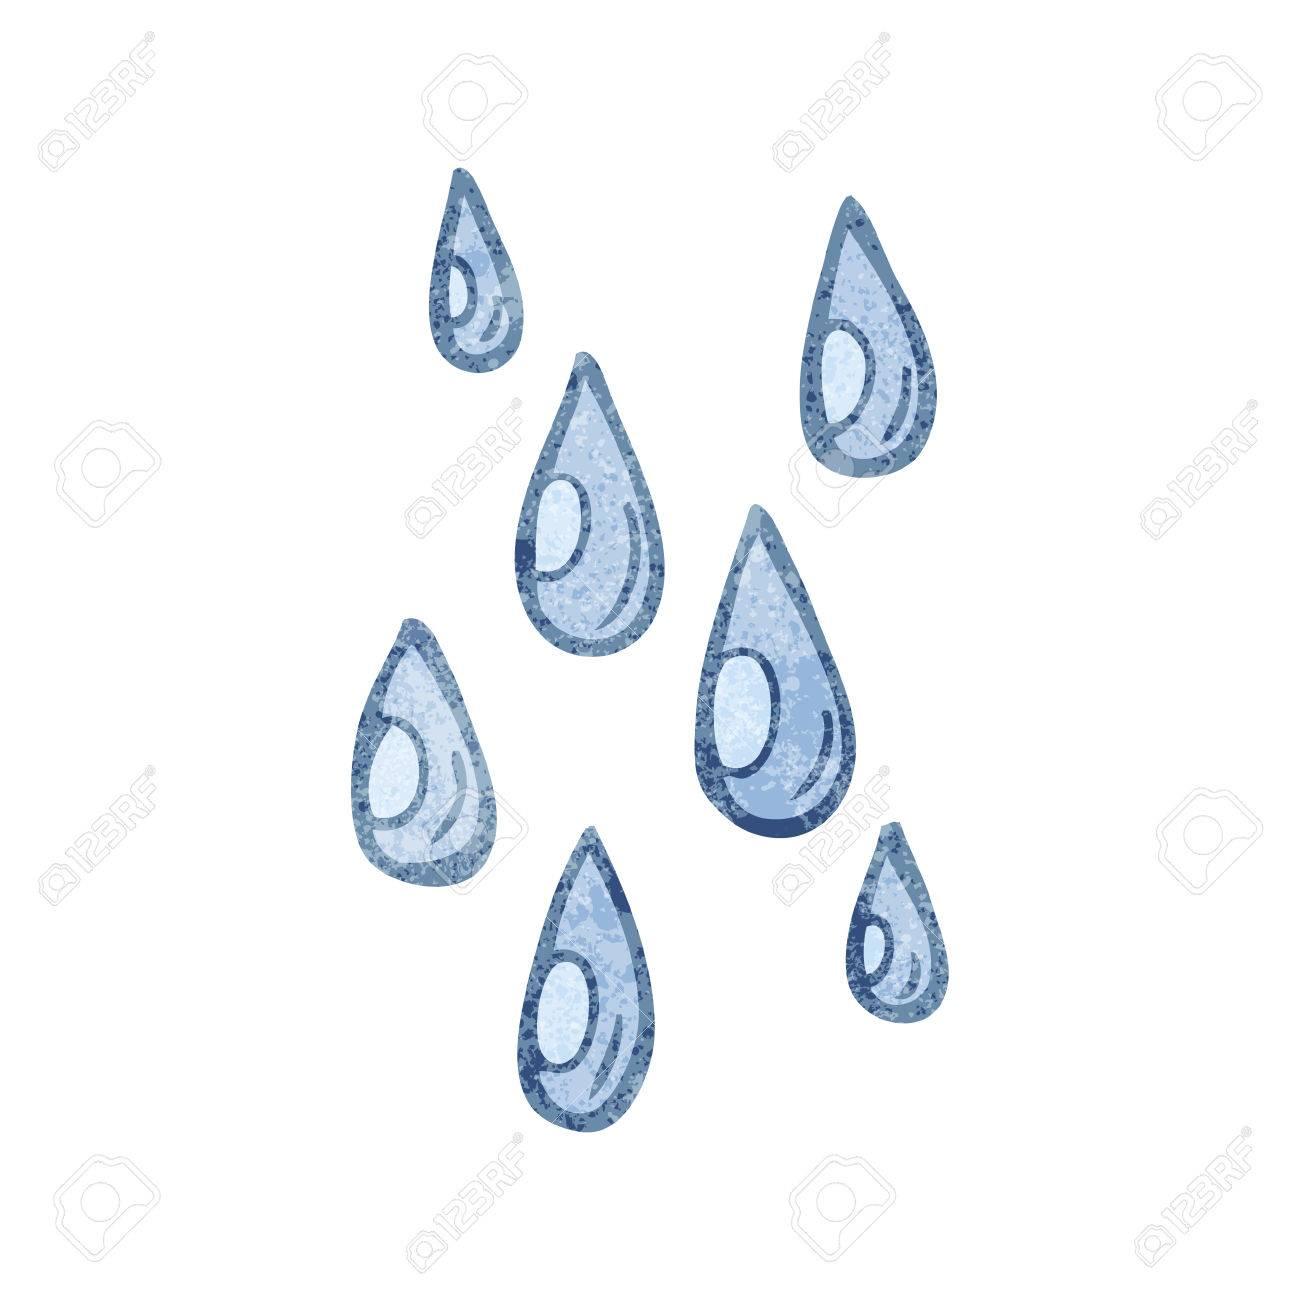 freehand textured cartoon raindrops royalty free cliparts vectors rh 123rf com cartoon raindrops cartoon raindrops pictures